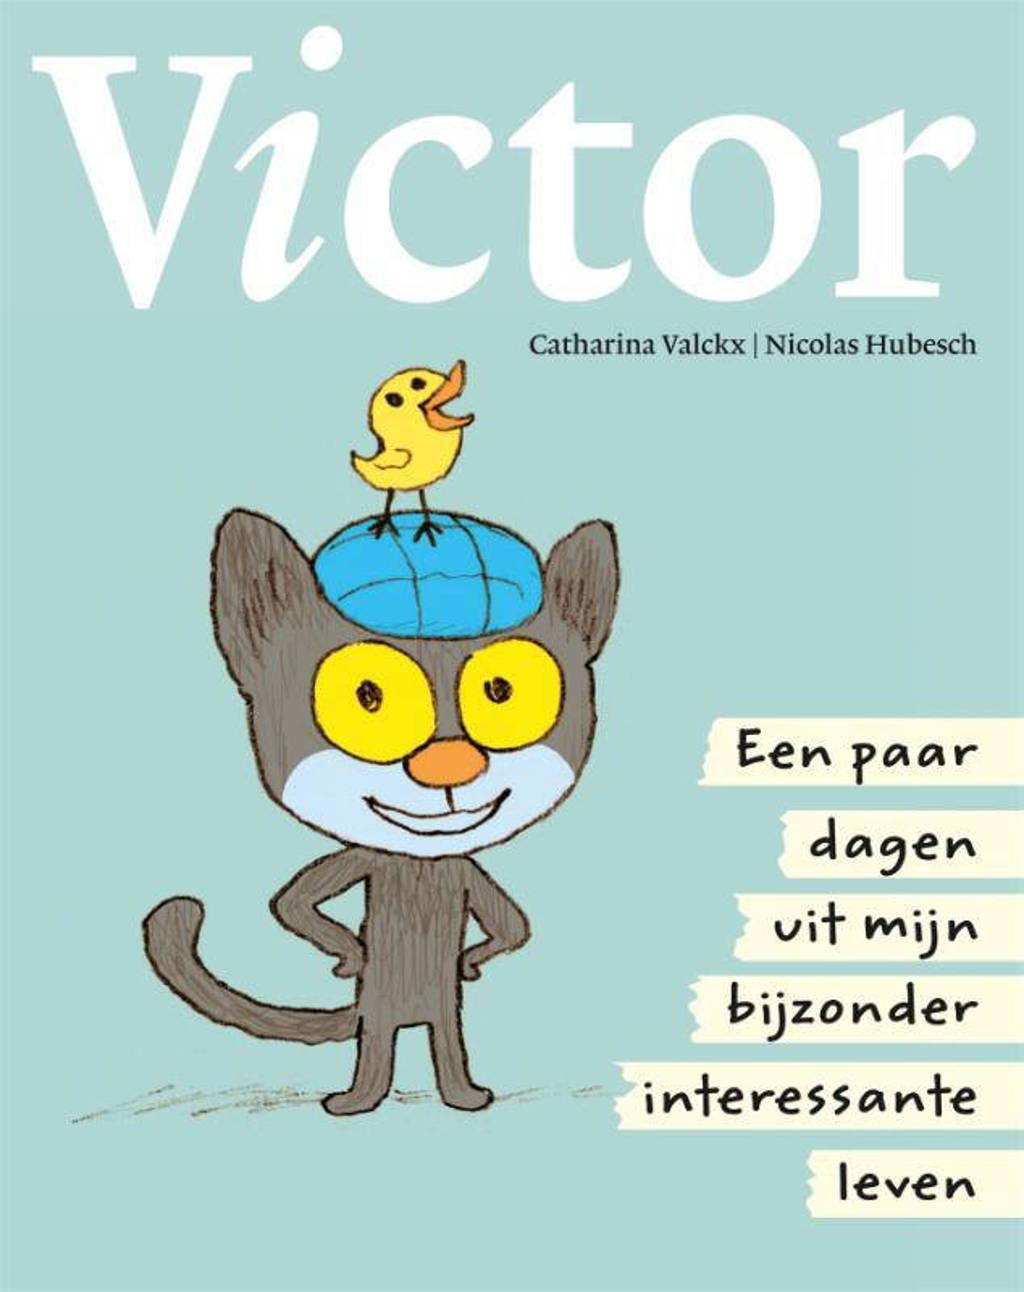 Victor - Catharina Valckx